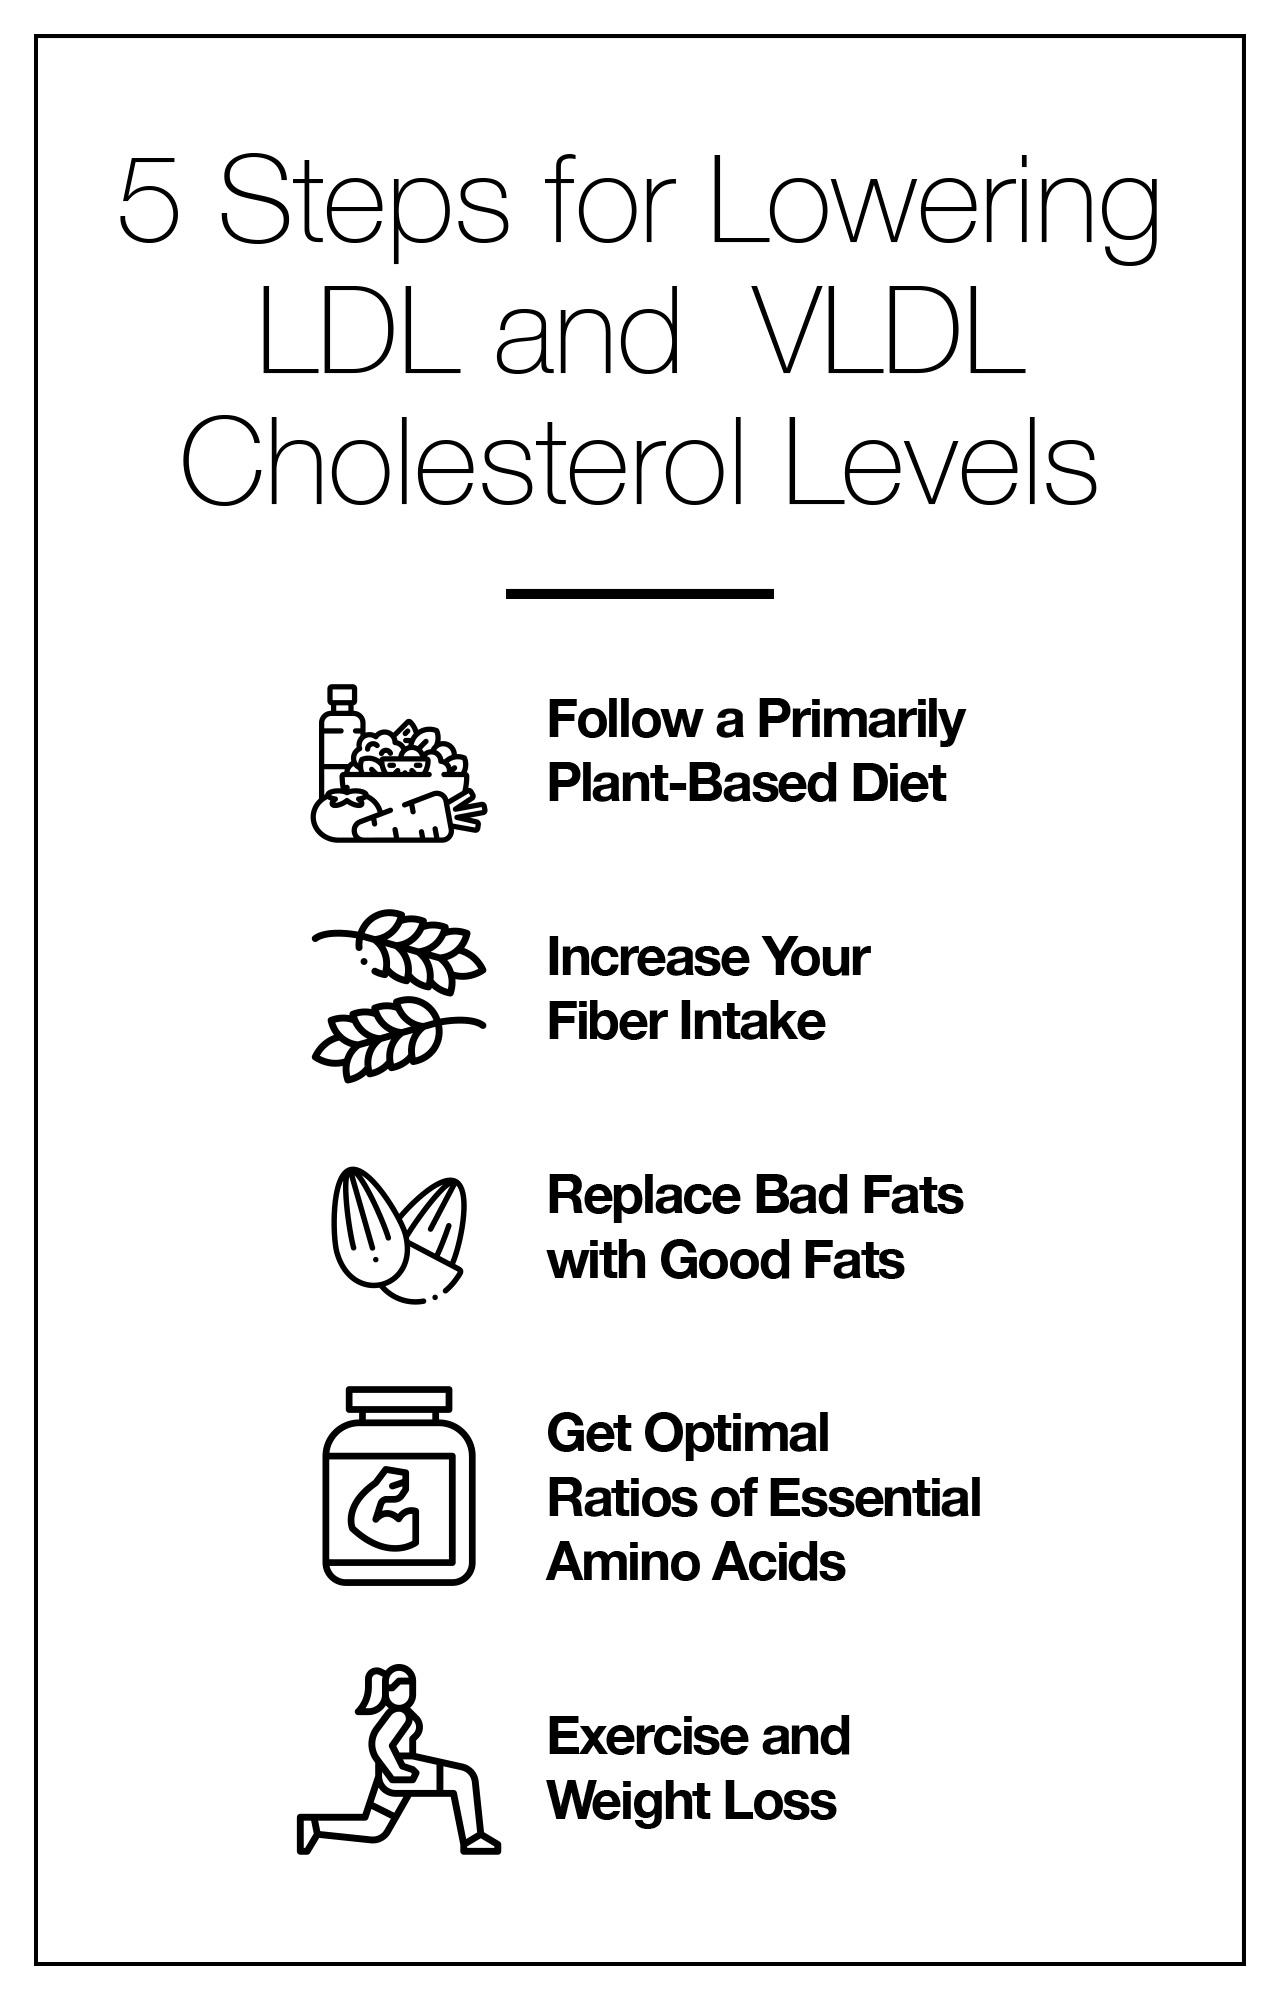 5 Steps for Lowering LDL and VLDL Cholesterol Levels